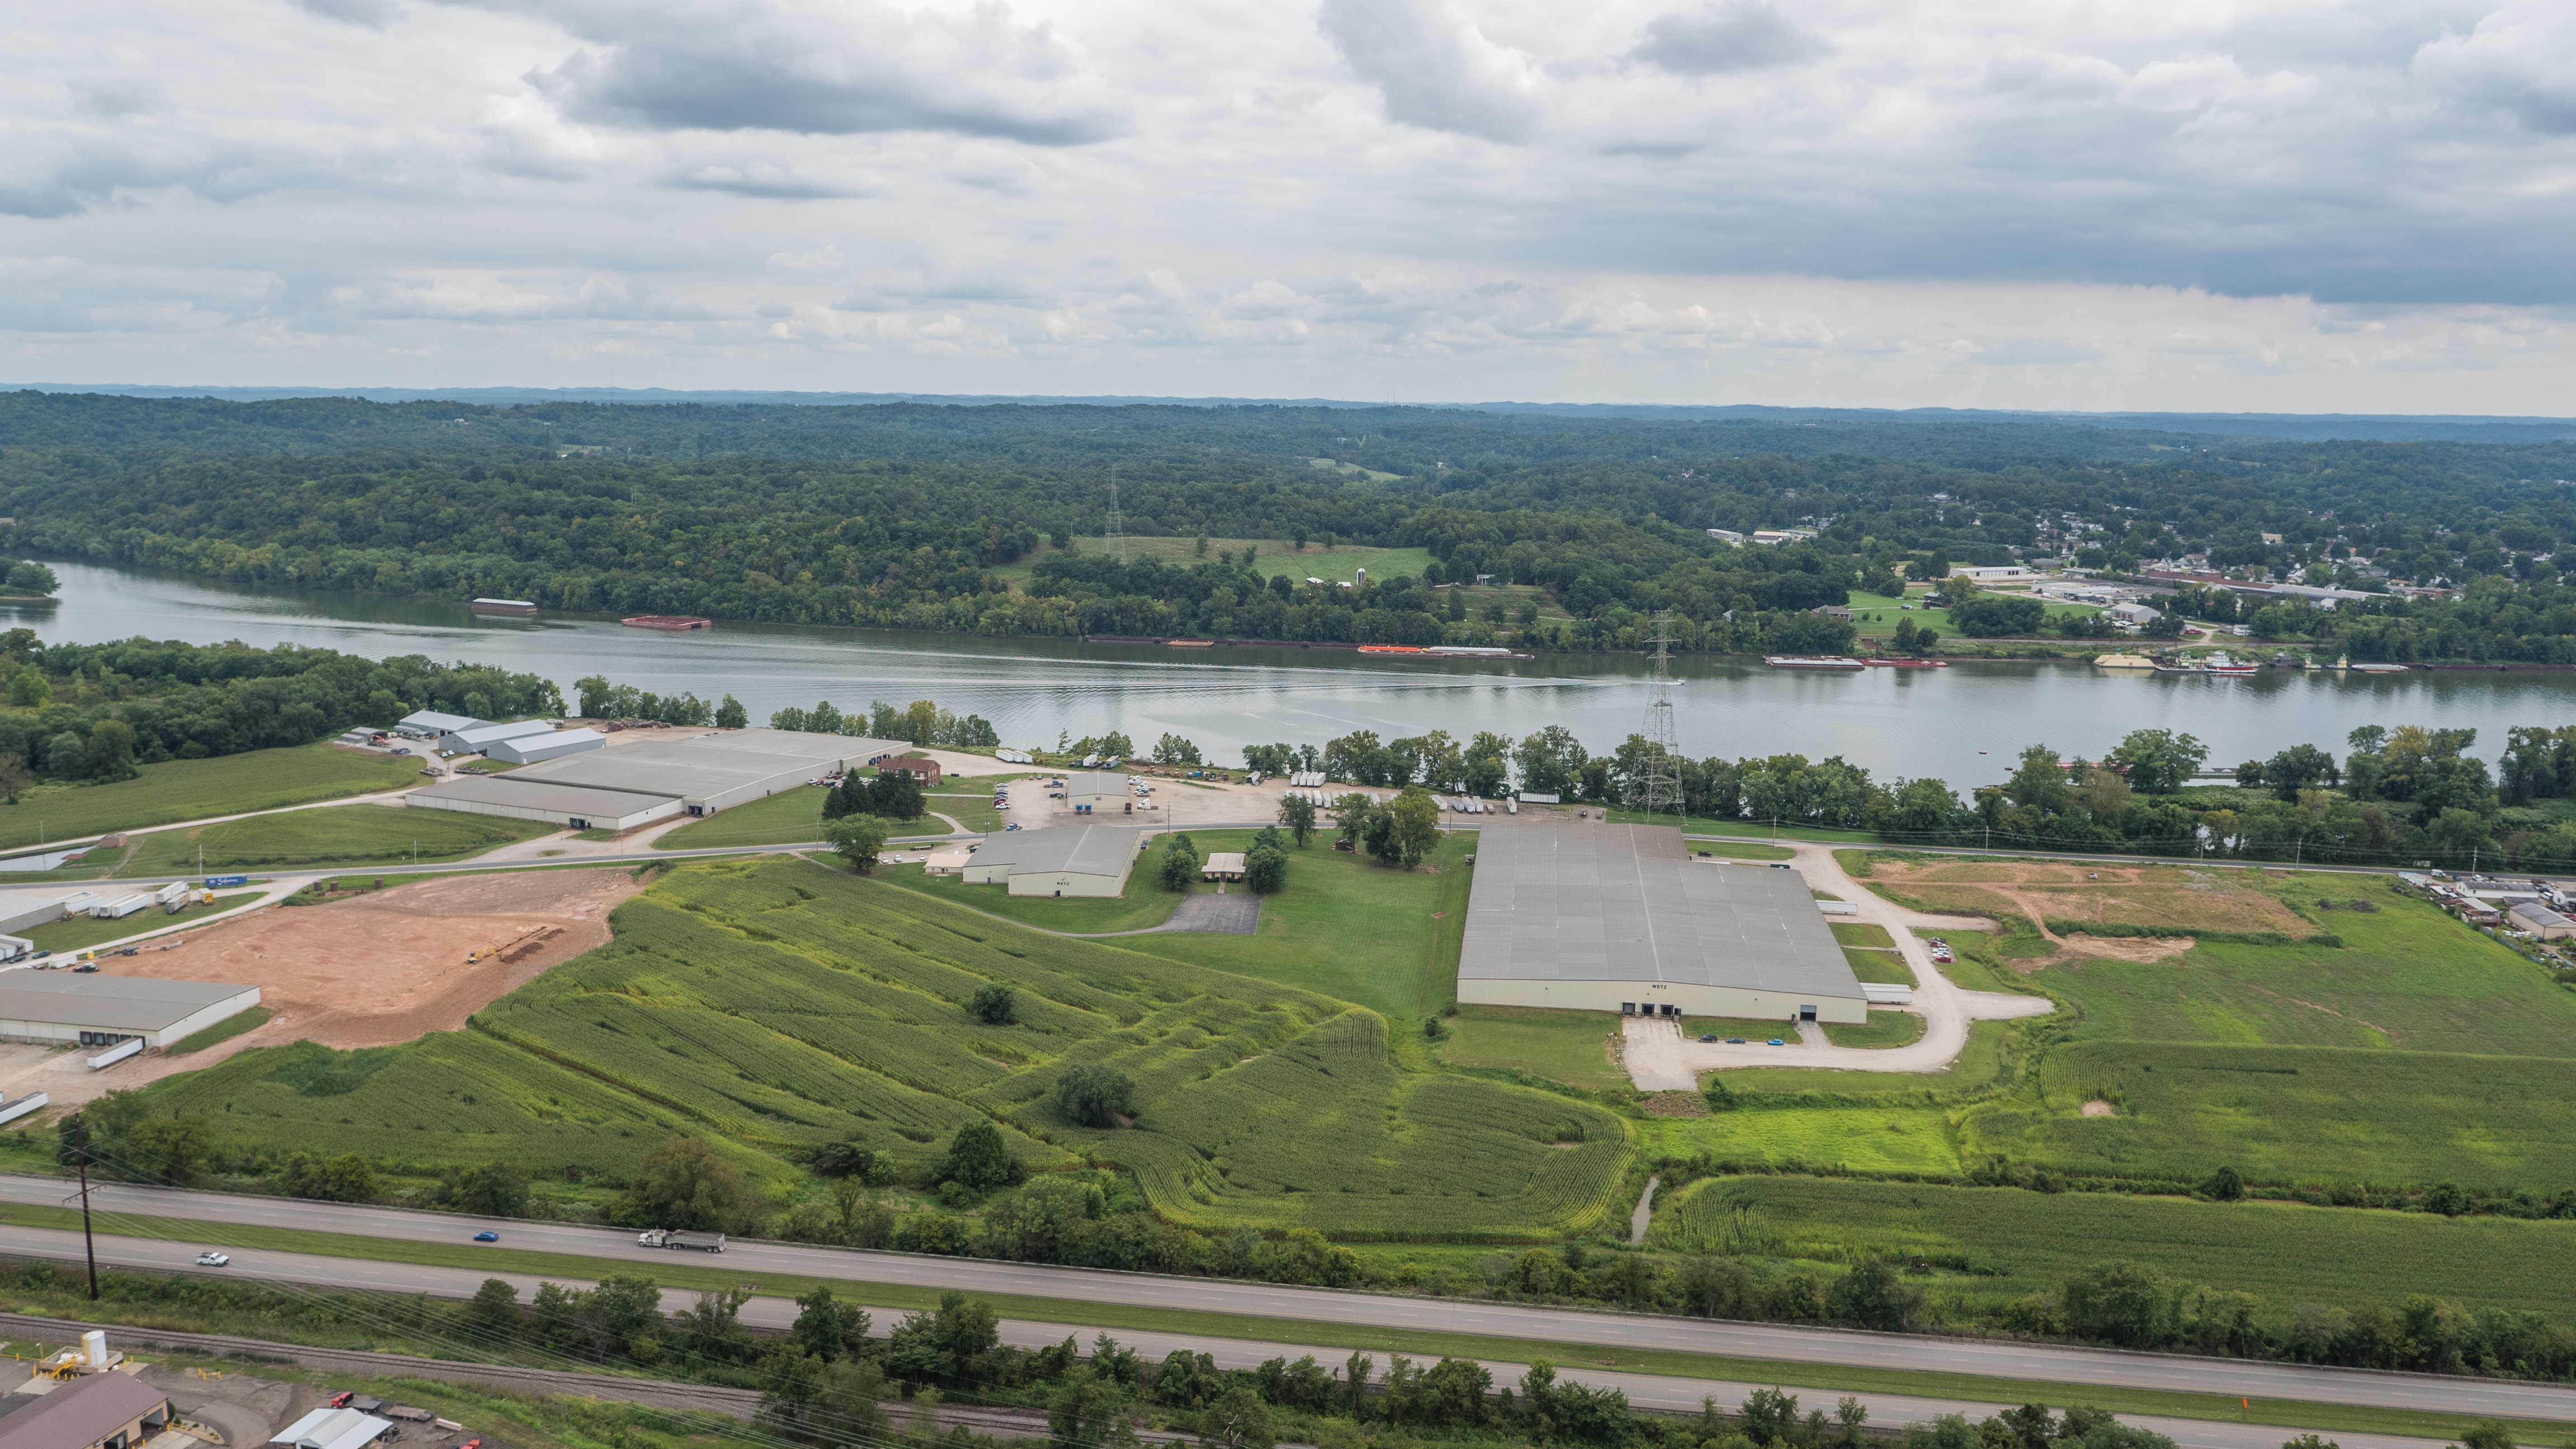 Aerial image of Wetz Warehouse Sites